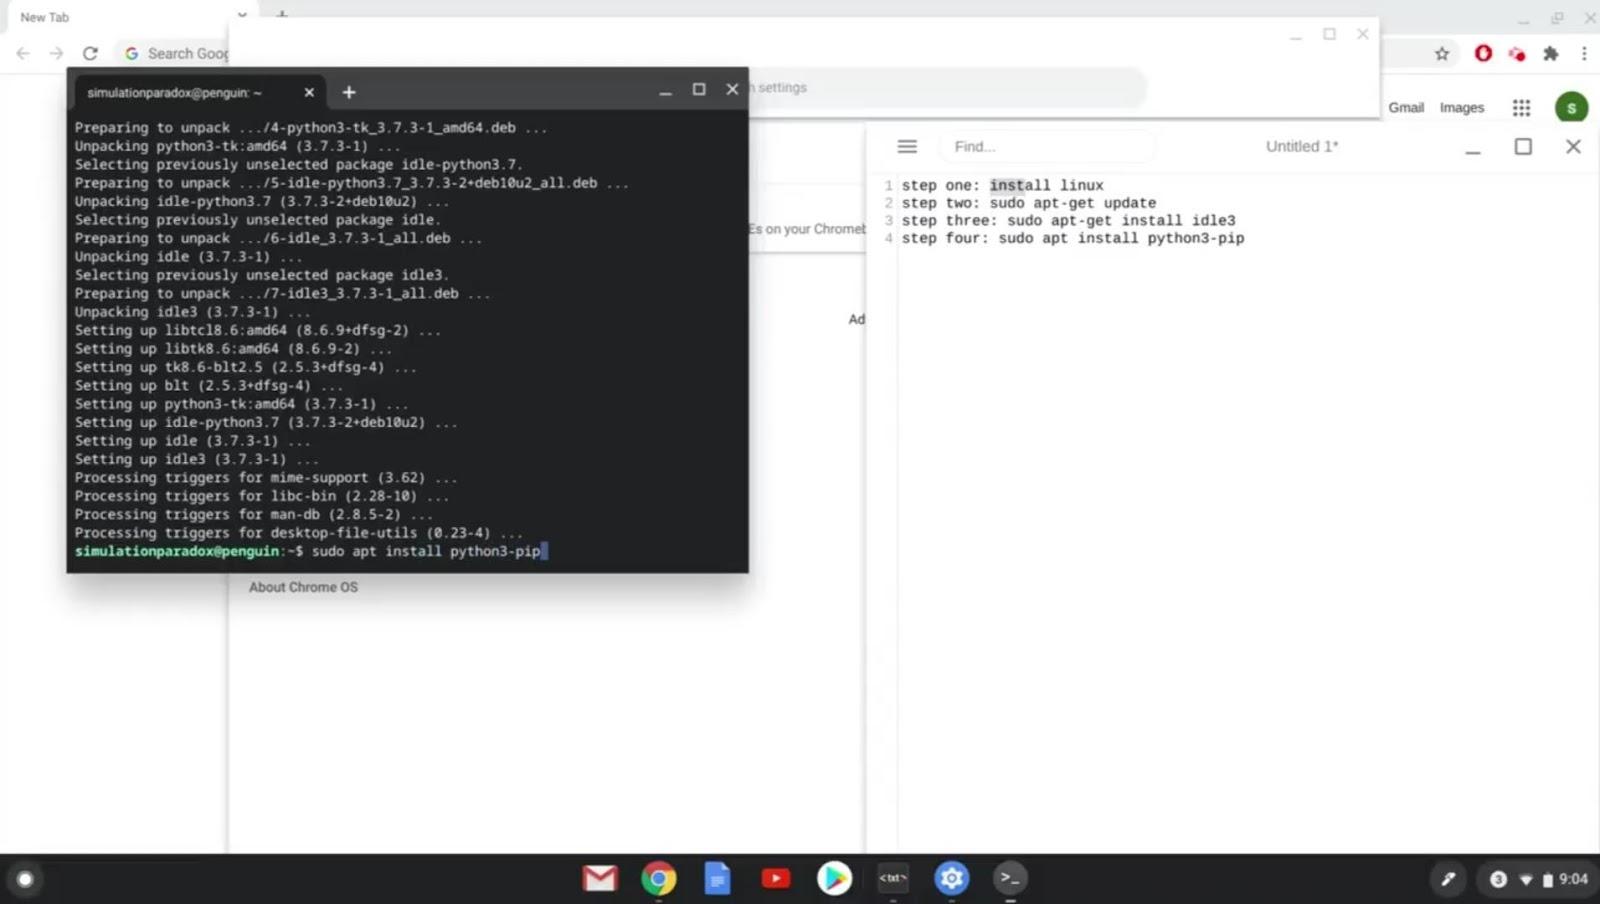 n JzDcW 8jF19rFnEDh5Fey2RoF4HEHHedWiE YANB96scfJq1DLoeTLnZby1CfJLlPUkTqL5SmmBFVkhVOLCEU01I28c16CO - how to install python on chromebook